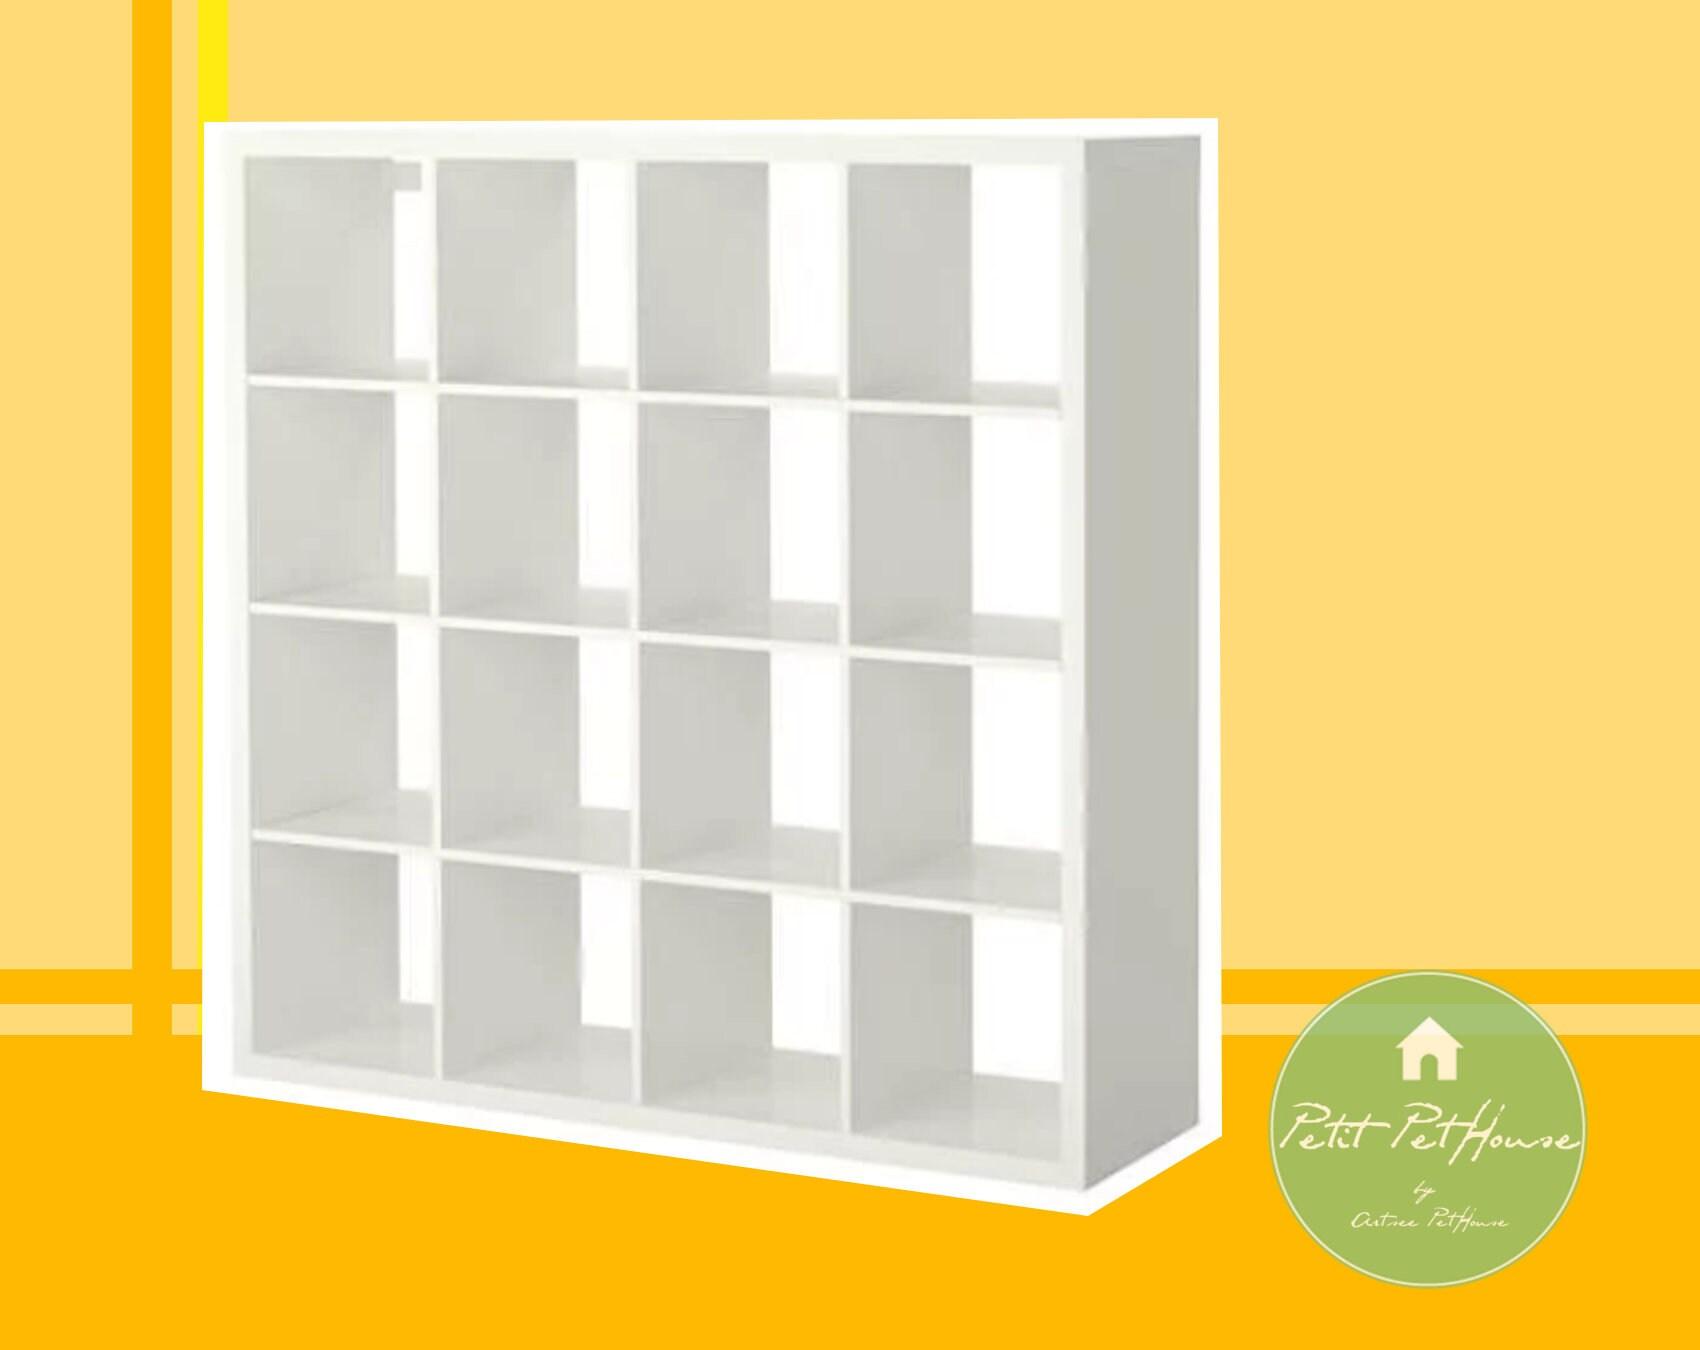 1 6 Ikea Inspired Dollhouse Miniature White 4x4 Wooden Shelf